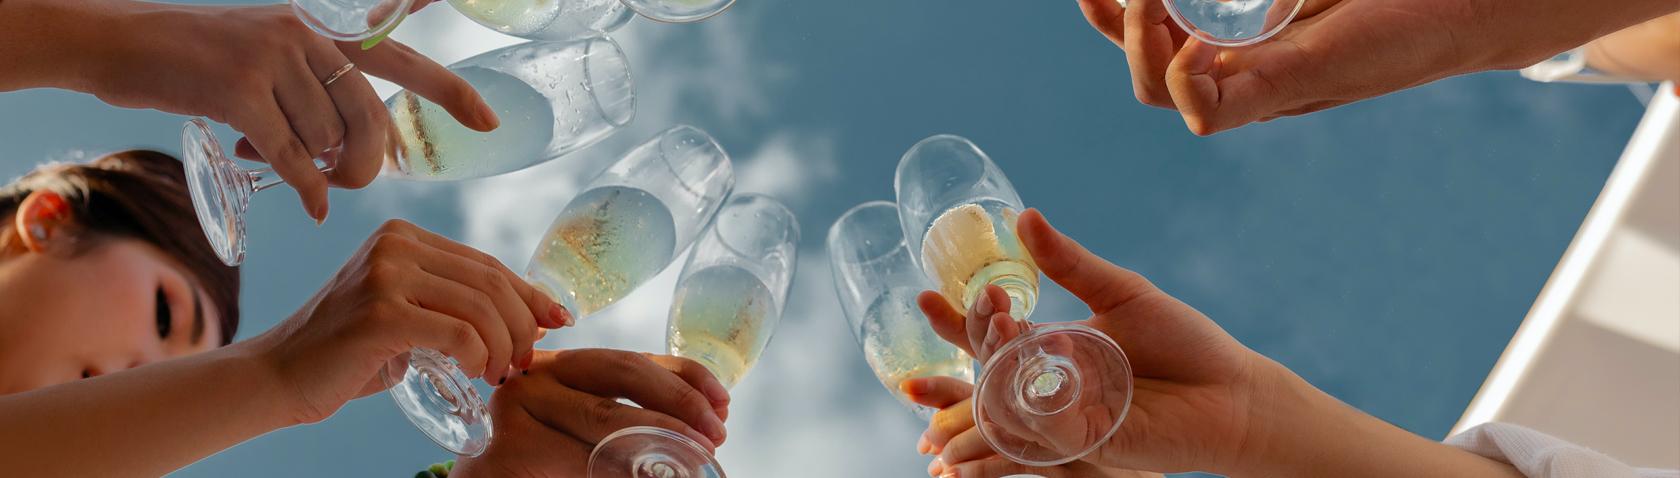 Champagne hero image